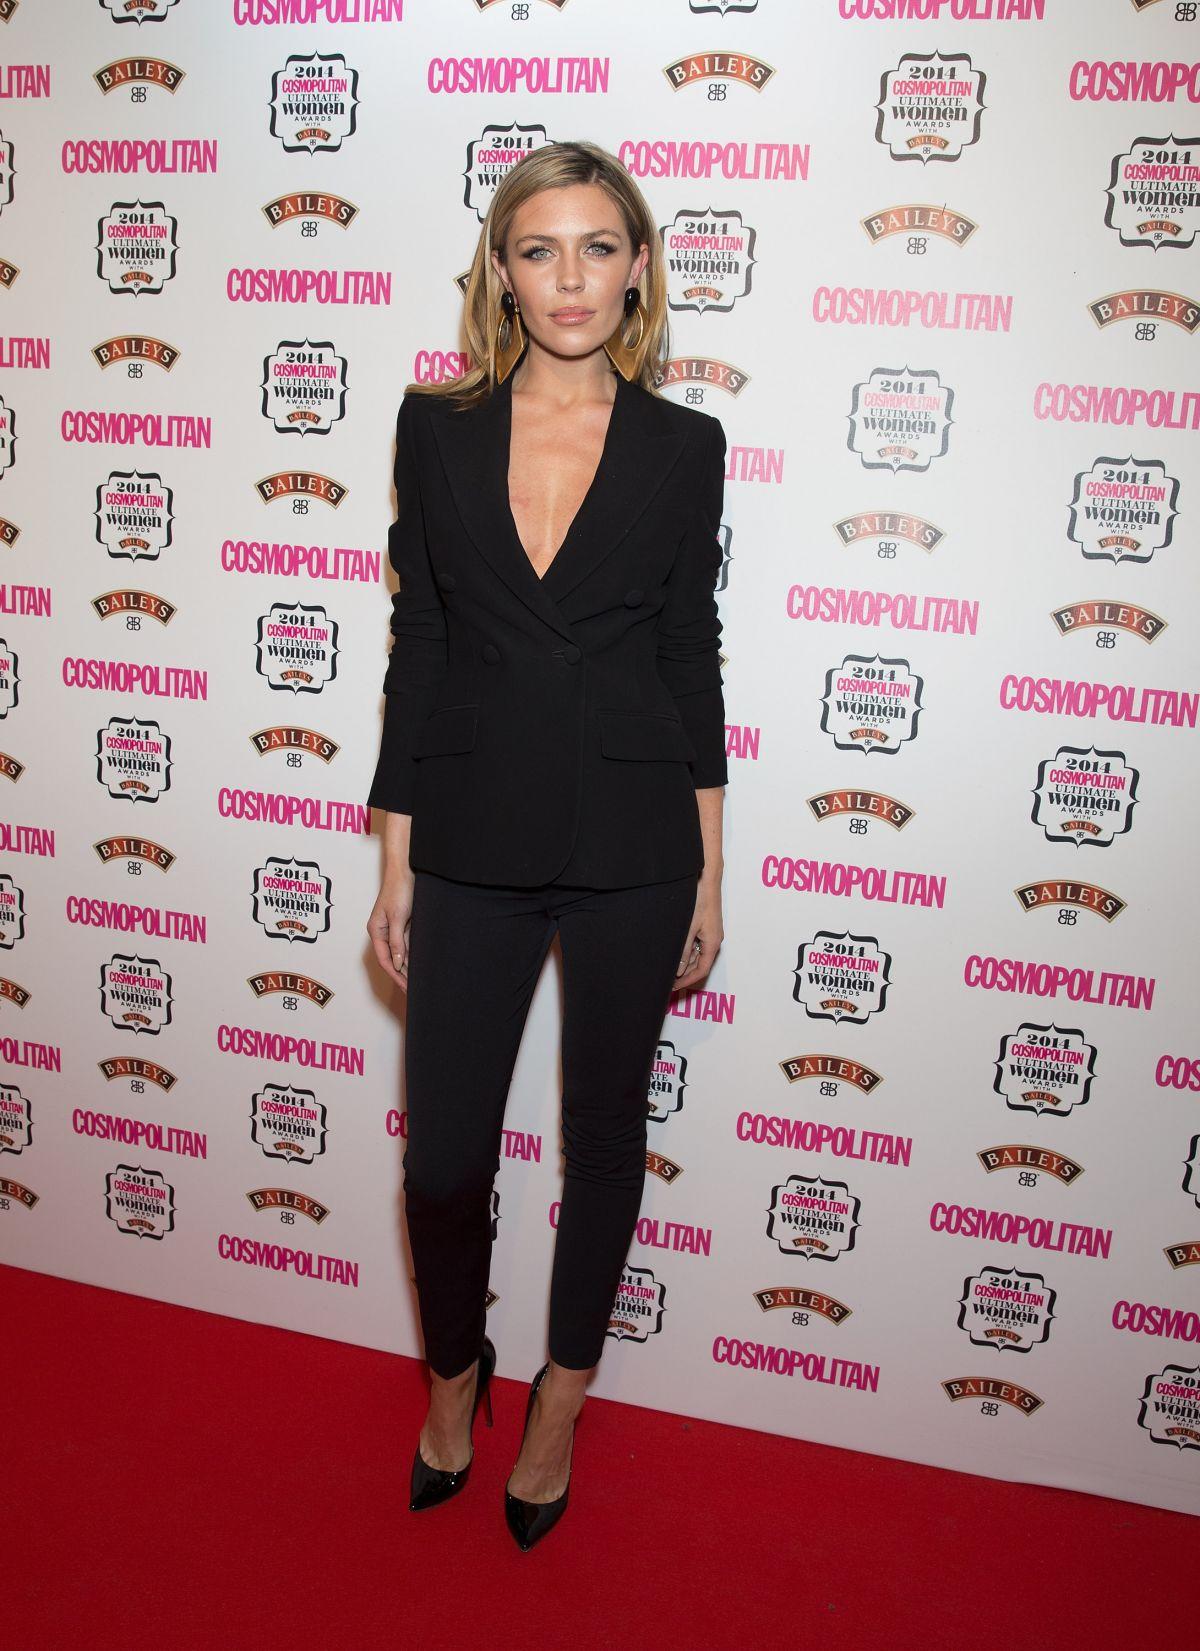 ABIGAIL ABBEY CLANCY at Cosmopolitan Ultimate Women Awards 2014 in London